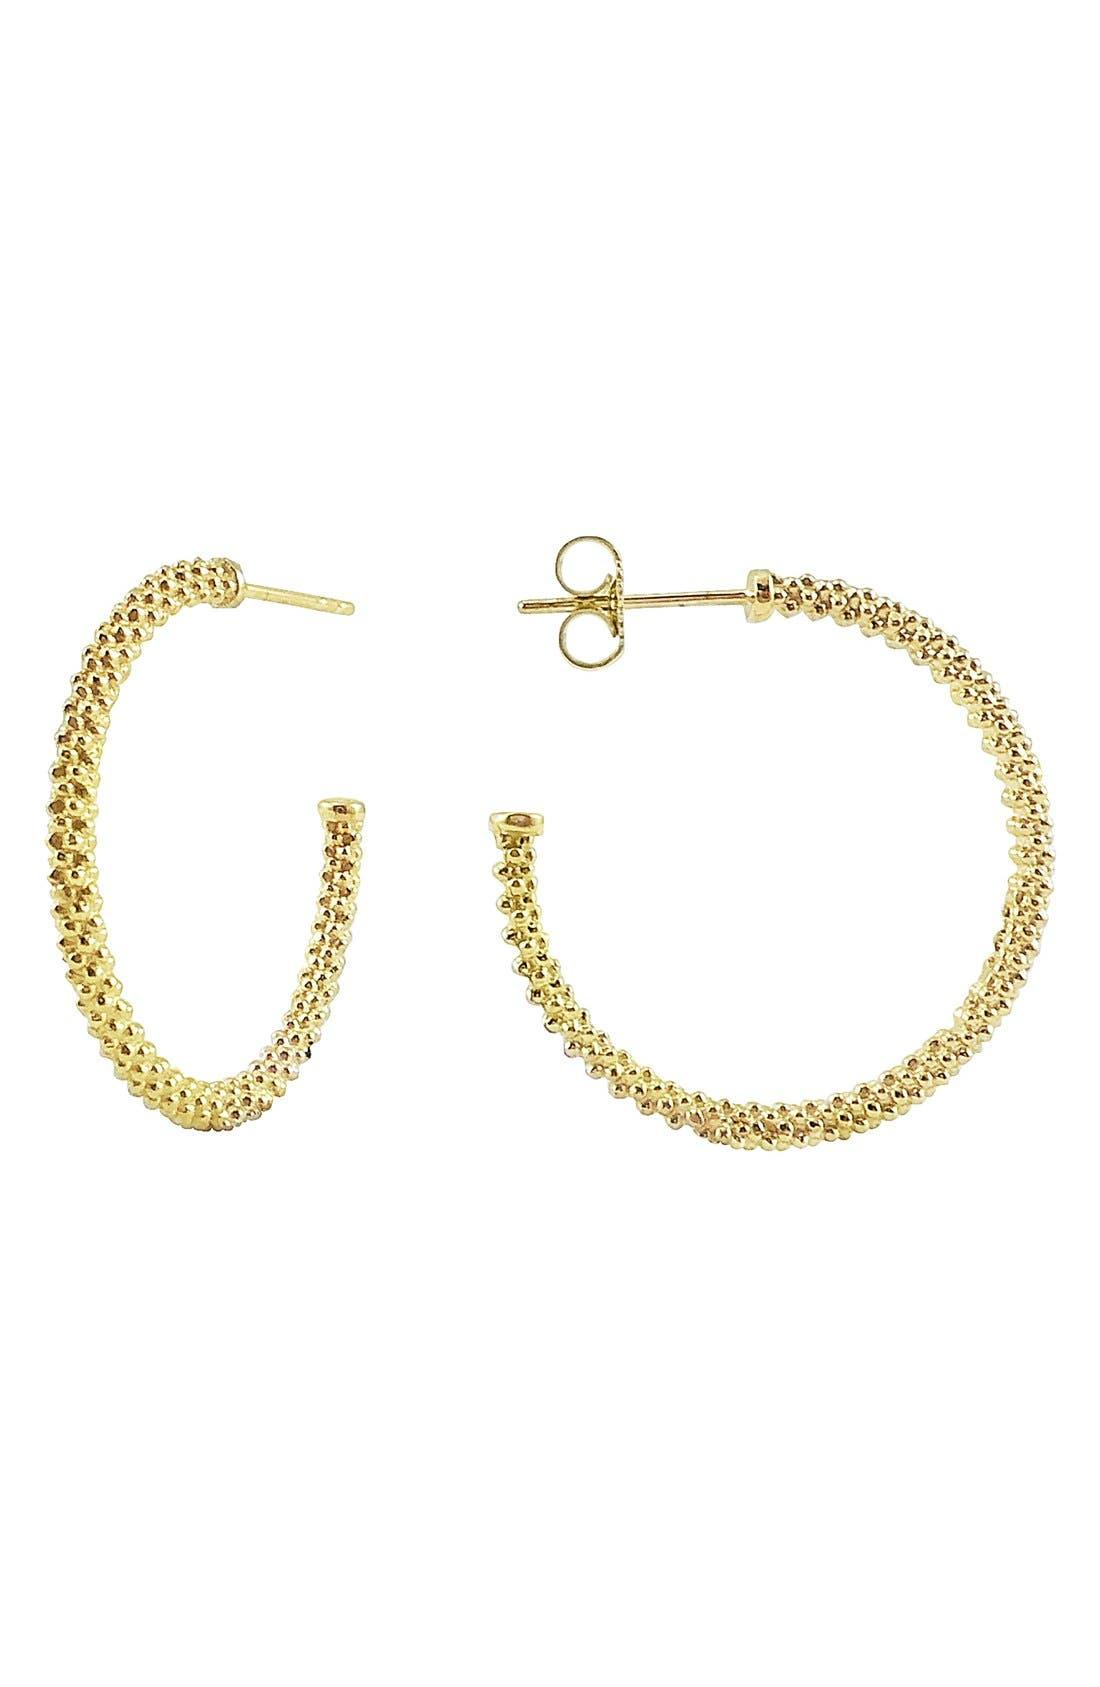 Caviar Hoop Earrings,                         Main,                         color, GOLD